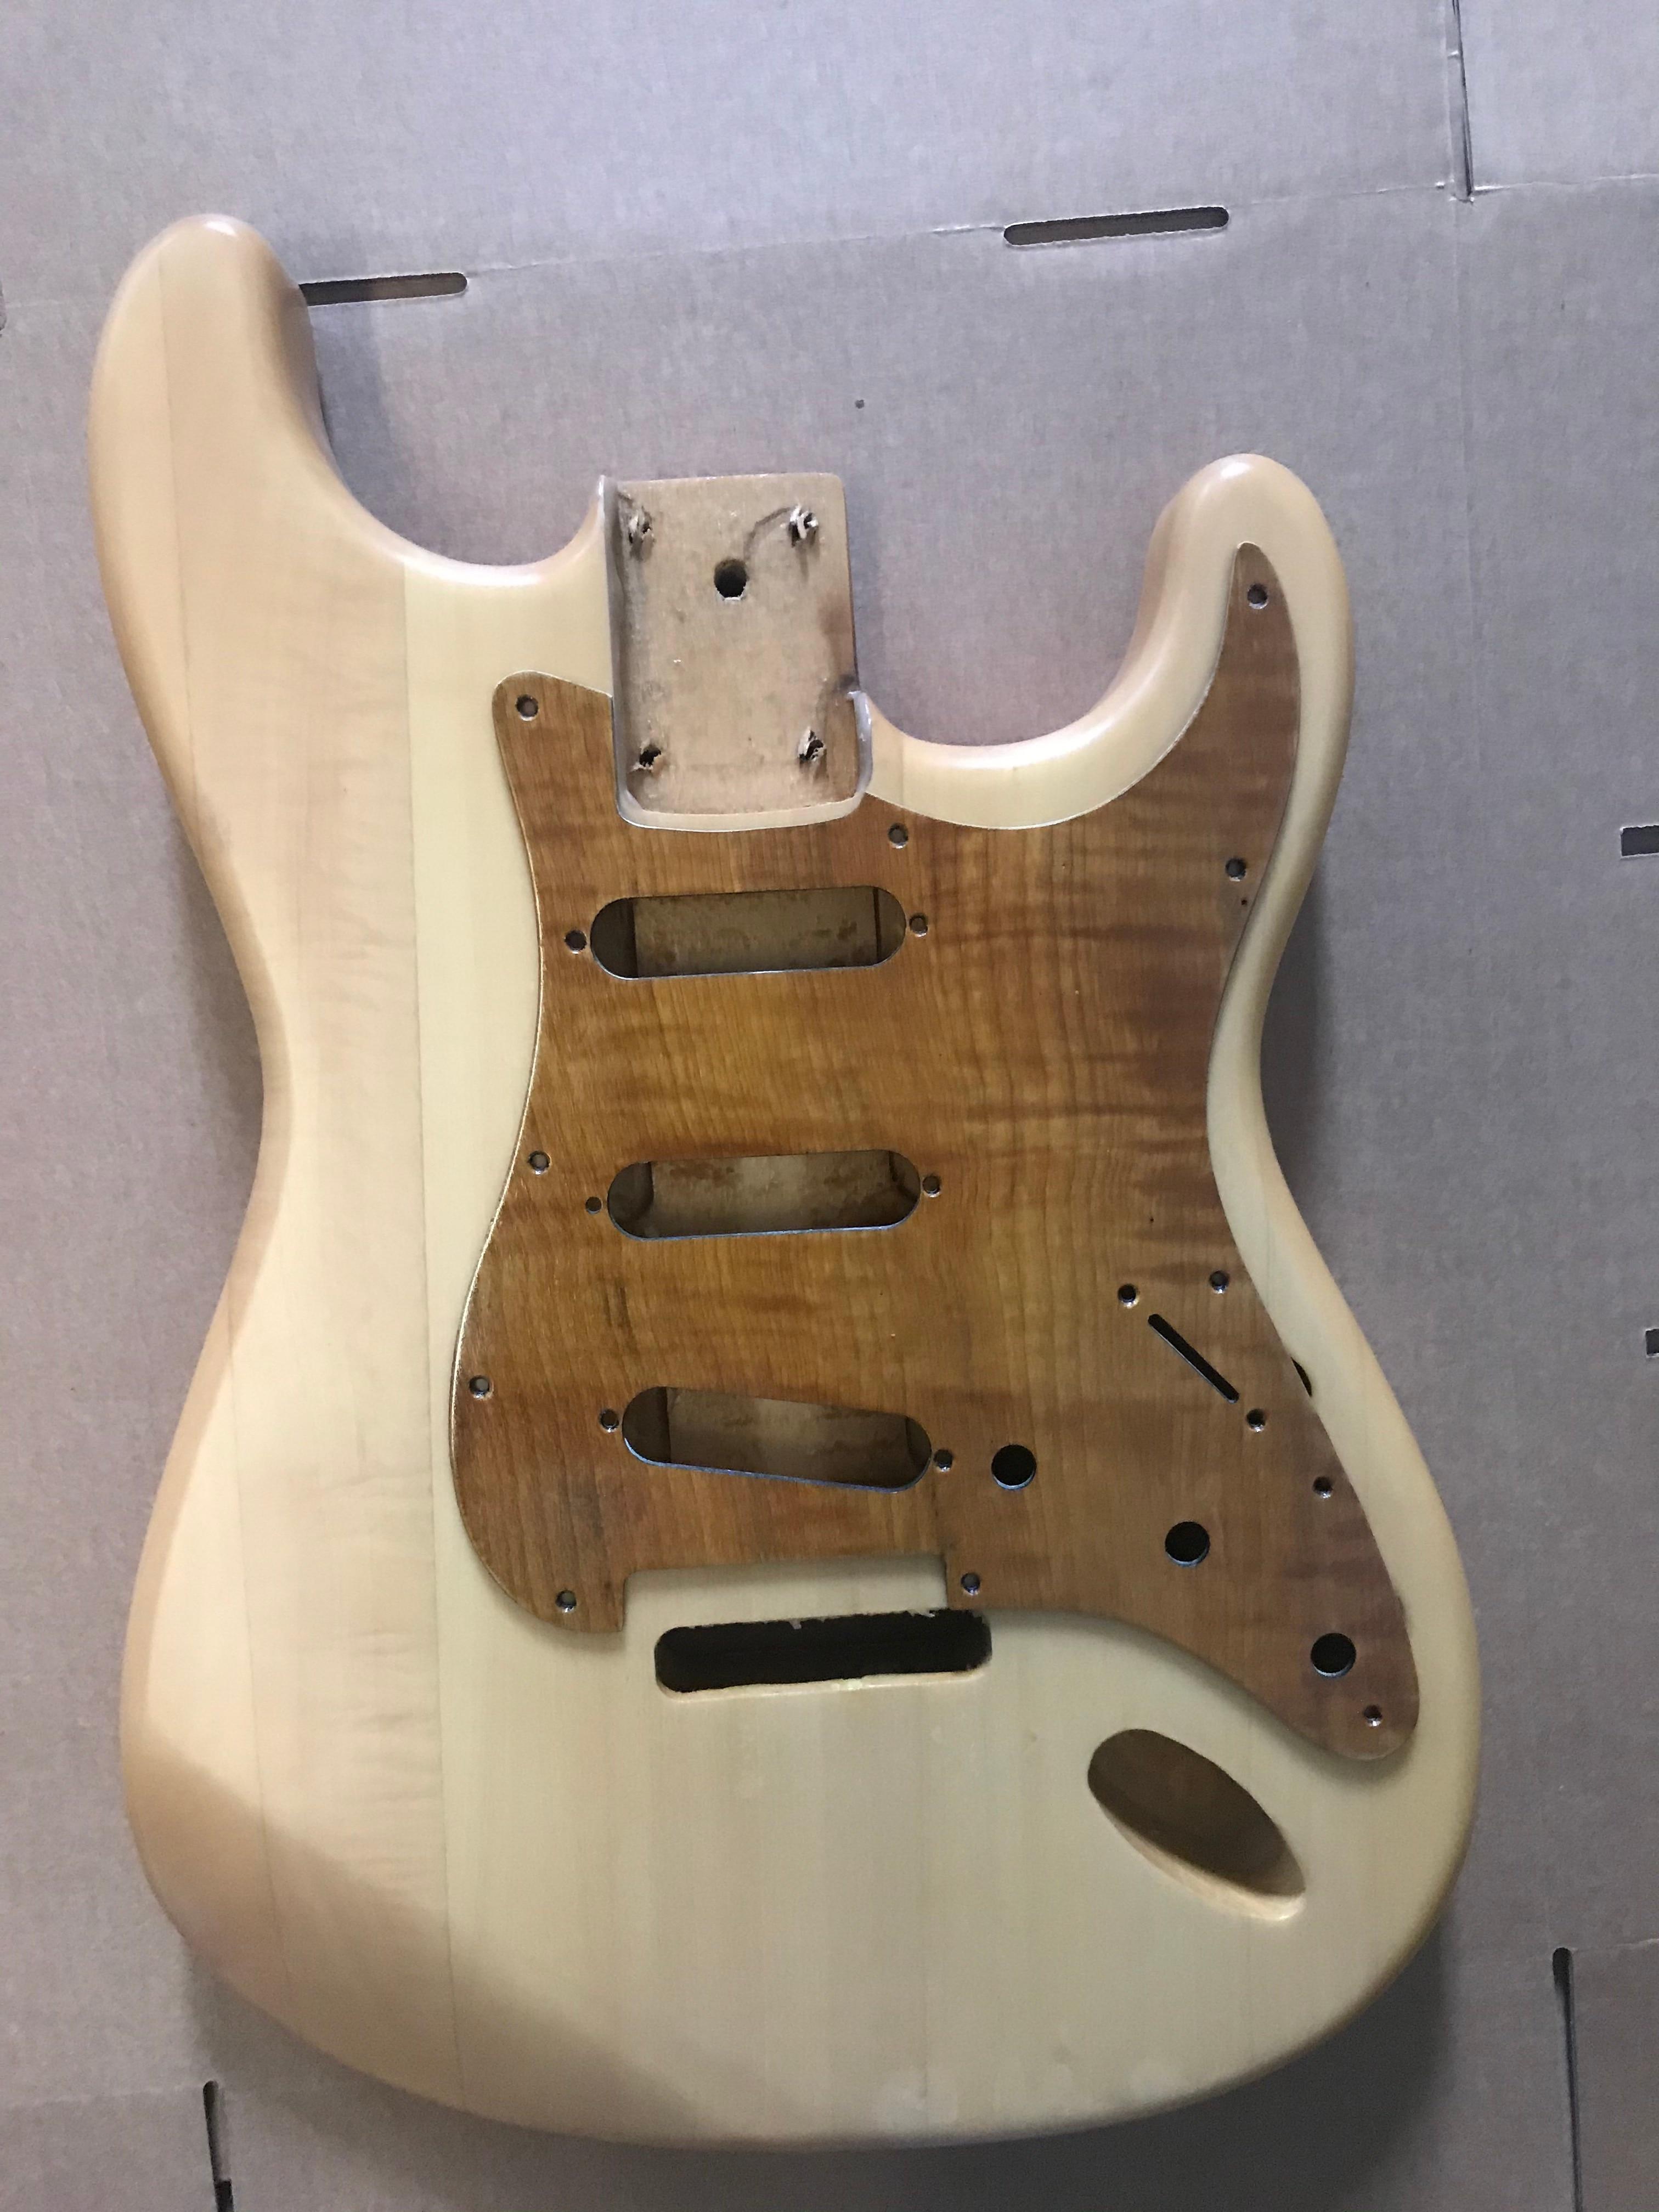 Semi-finished Manual DIY Guitar Barrel Strat Electric Guitar Body Alder Guitar Panel With Pickguard High Quality Maple Wood enlarge